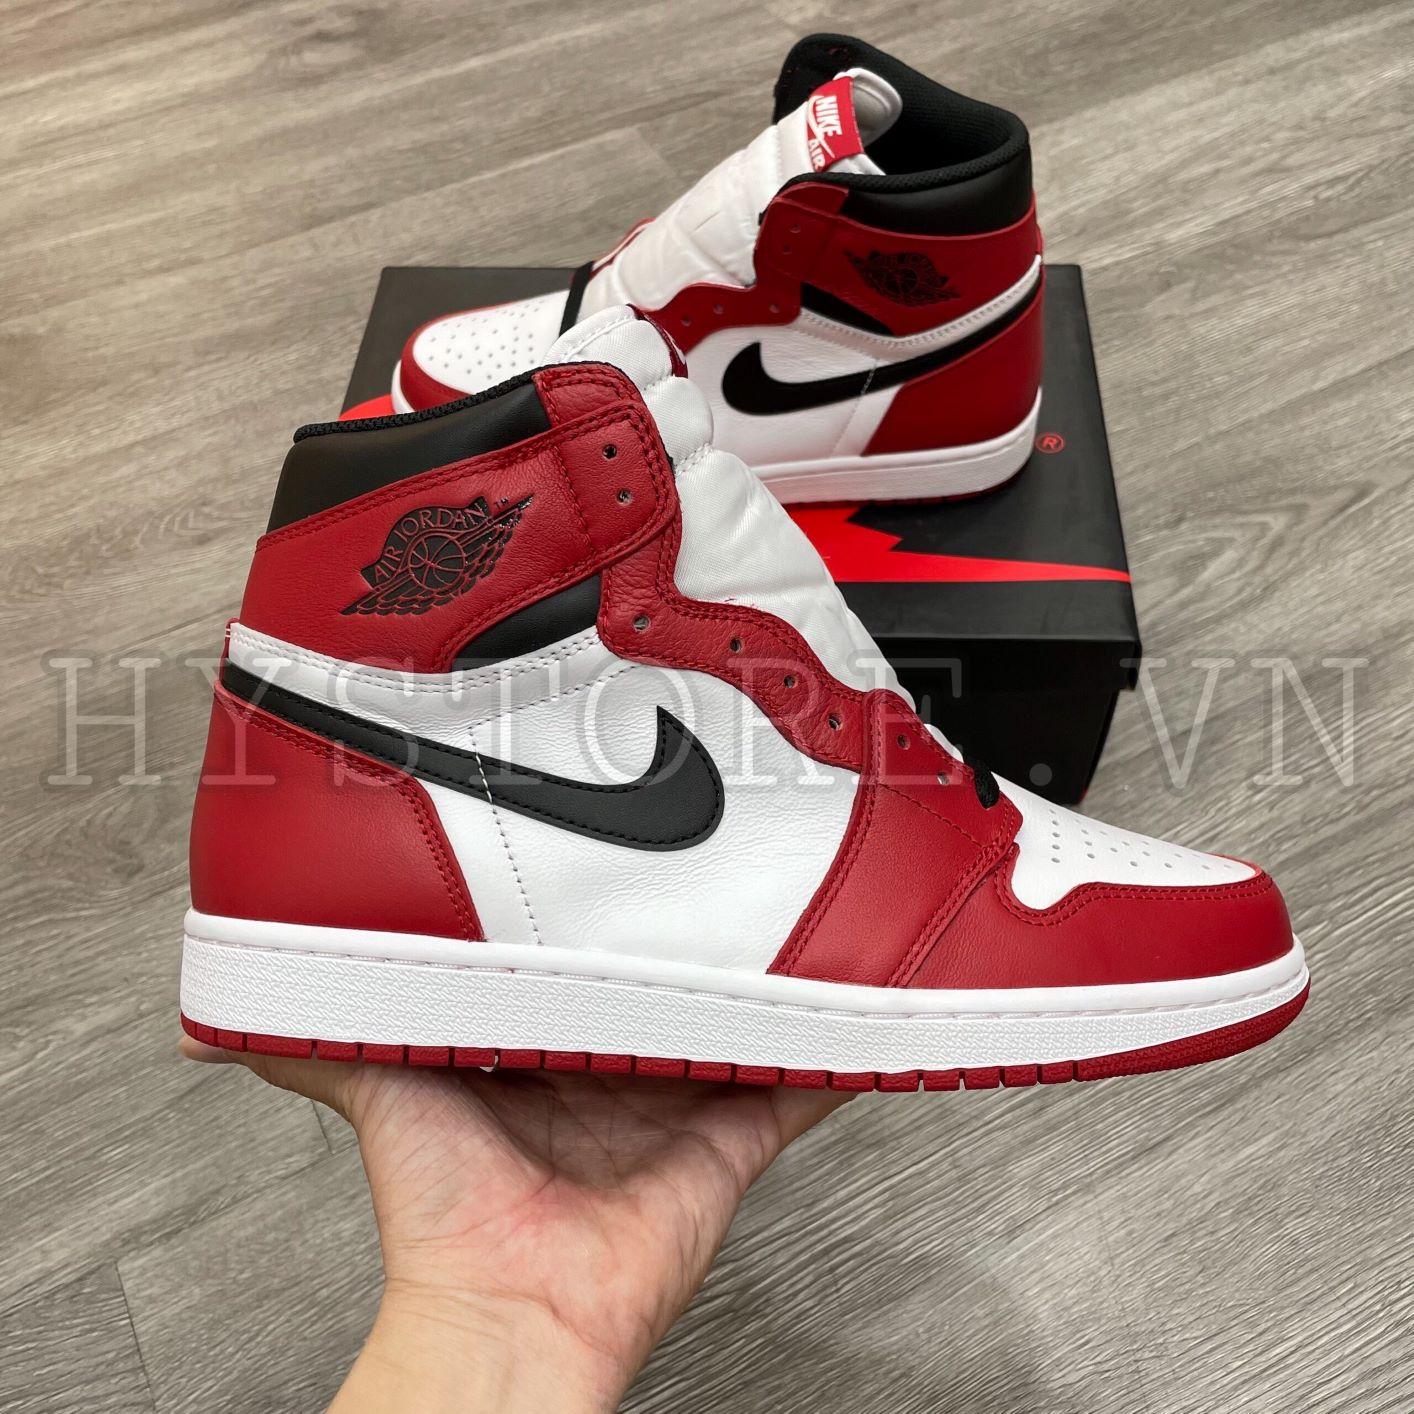 Giày Nike Air Jordan1 Chicago 2015